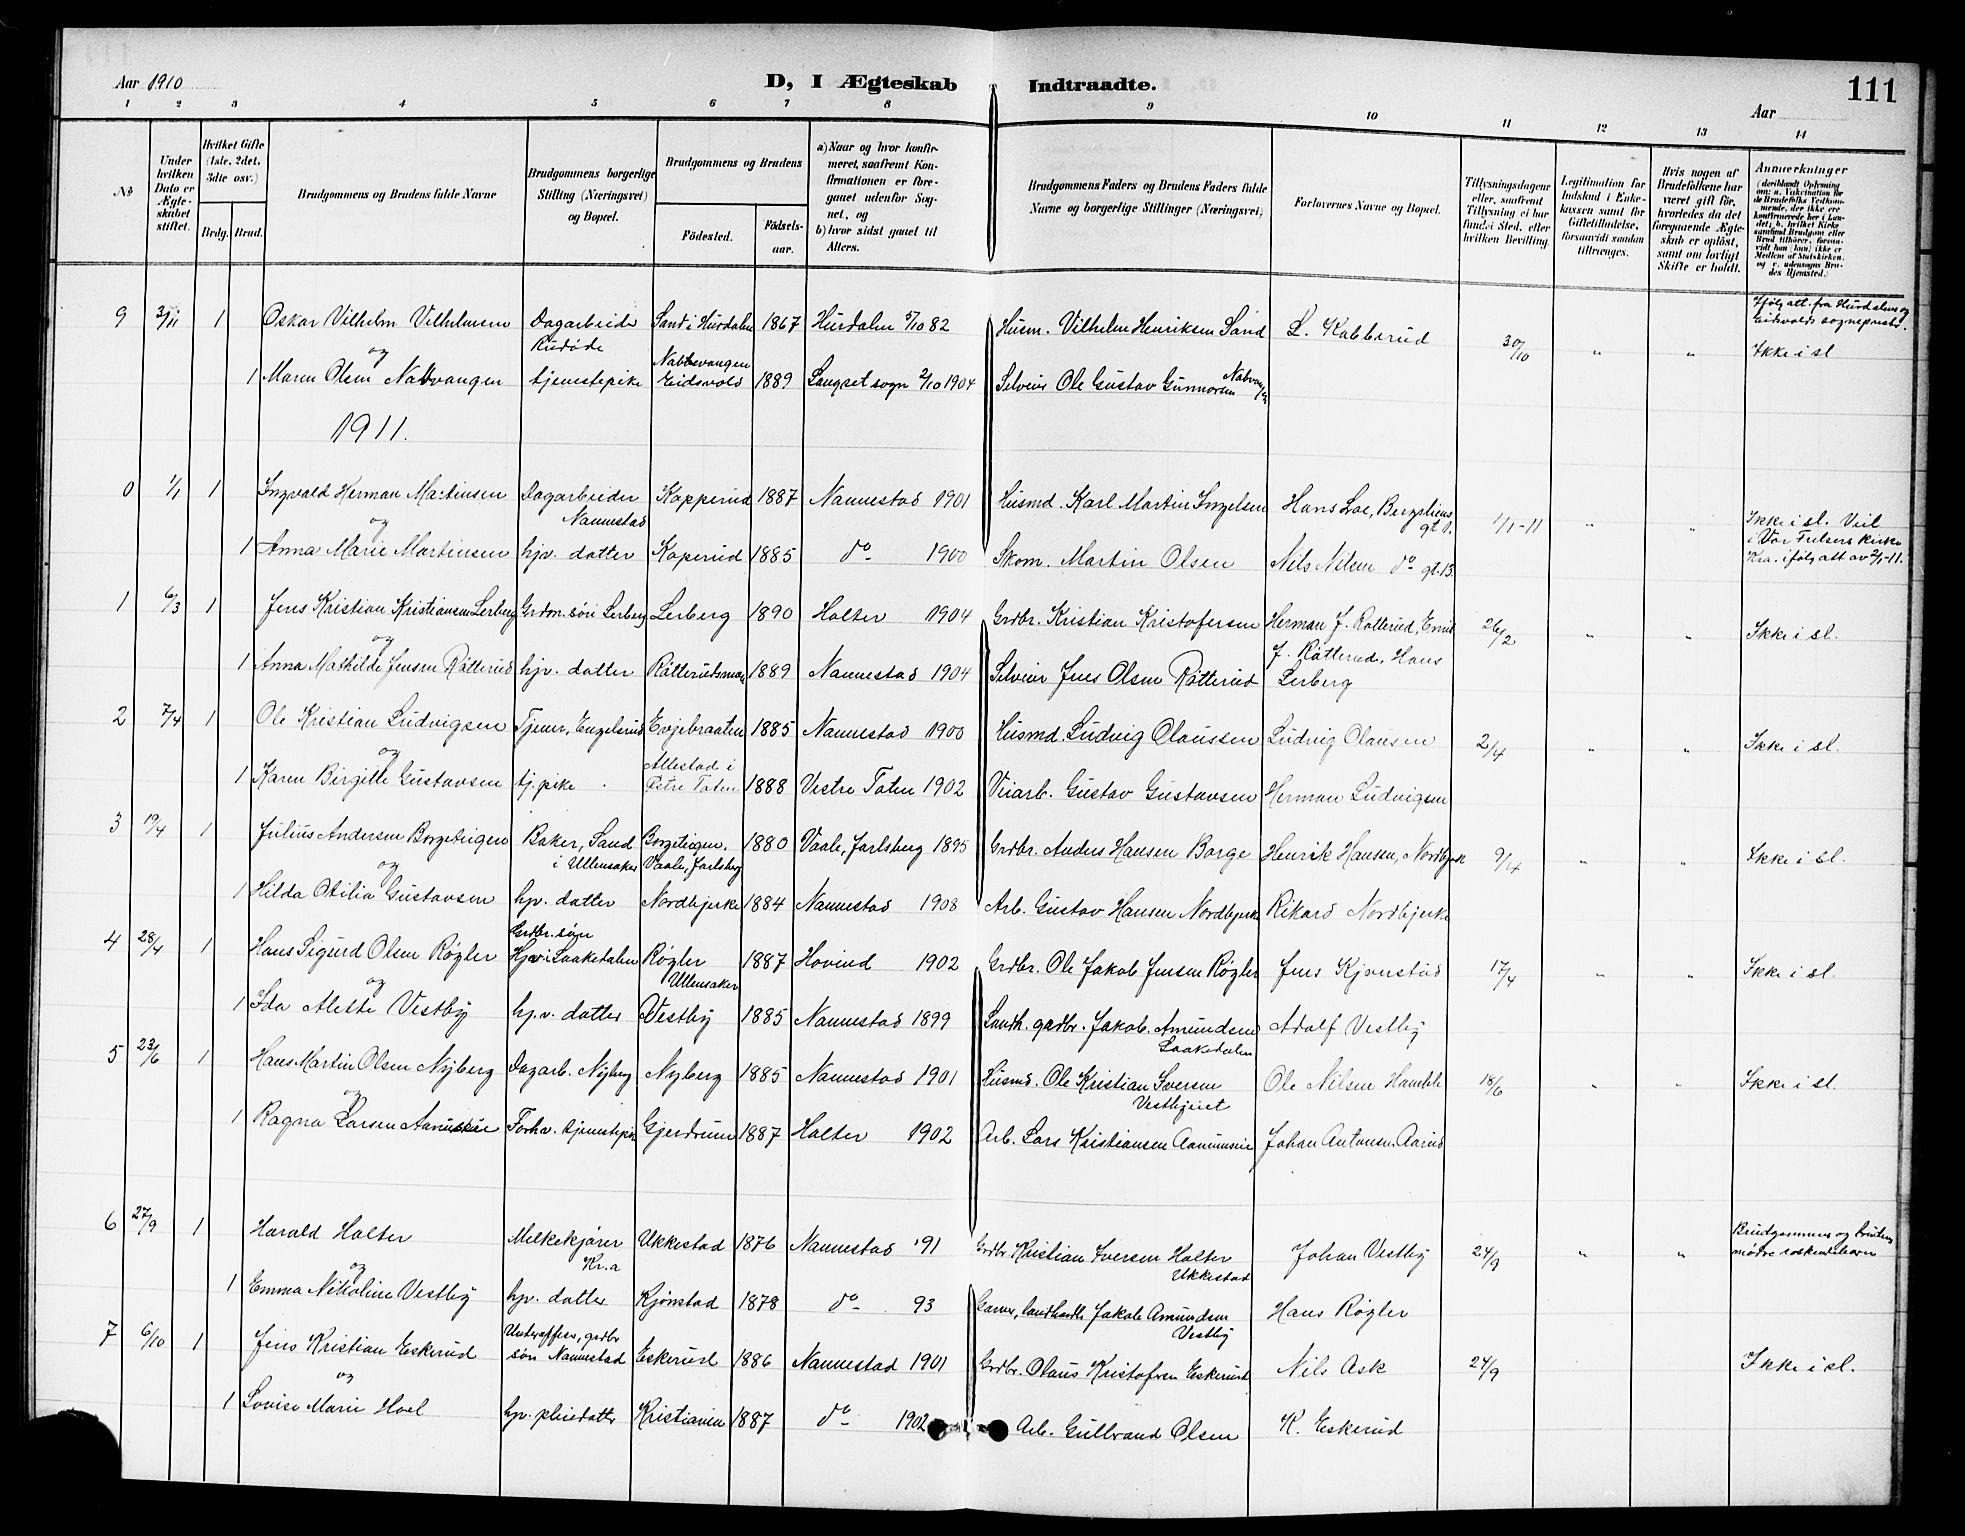 SAO, Nannestad prestekontor Kirkebøker, G/Ga/L0002: Klokkerbok nr. I 2, 1901-1913, s. 111